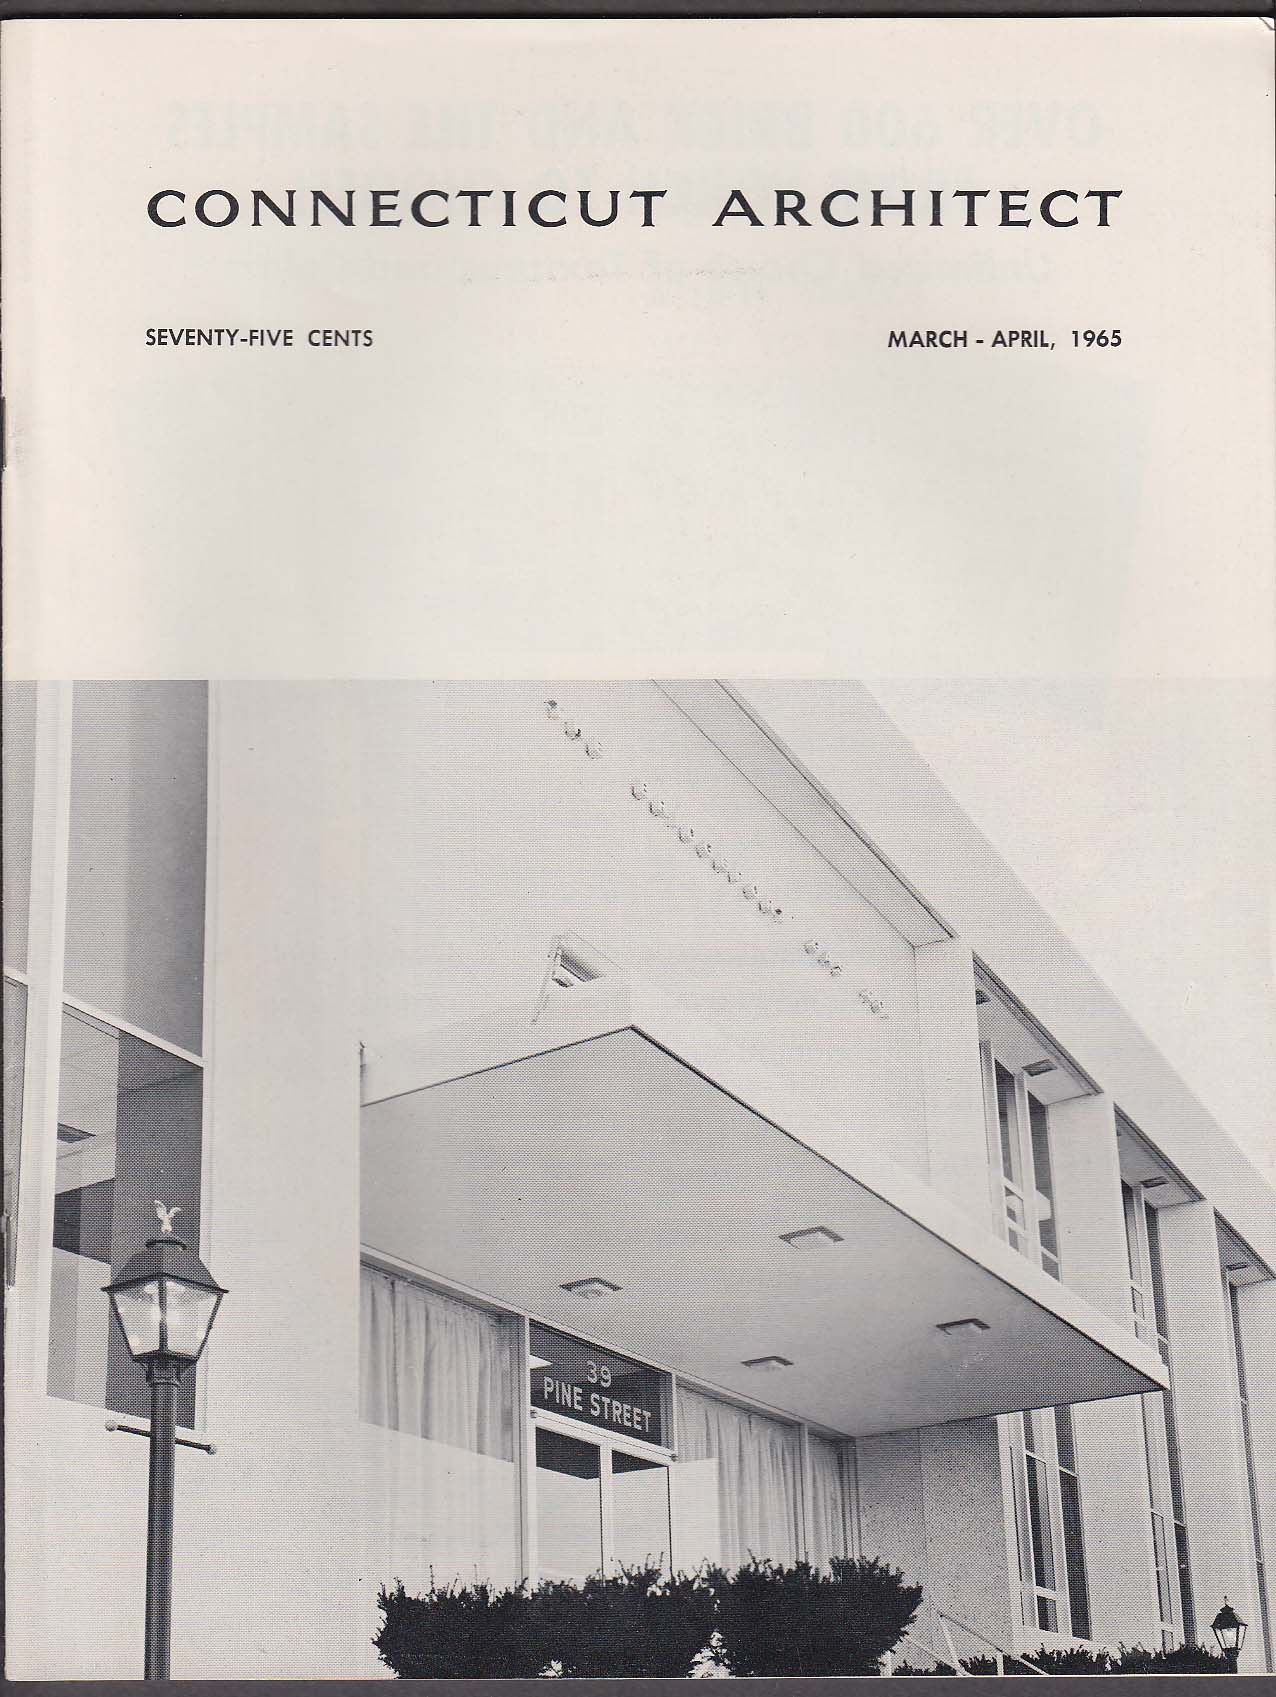 CONNECTICUT ARCHITECT Lighting Consultant Function & Economy ++ 3-4 1965